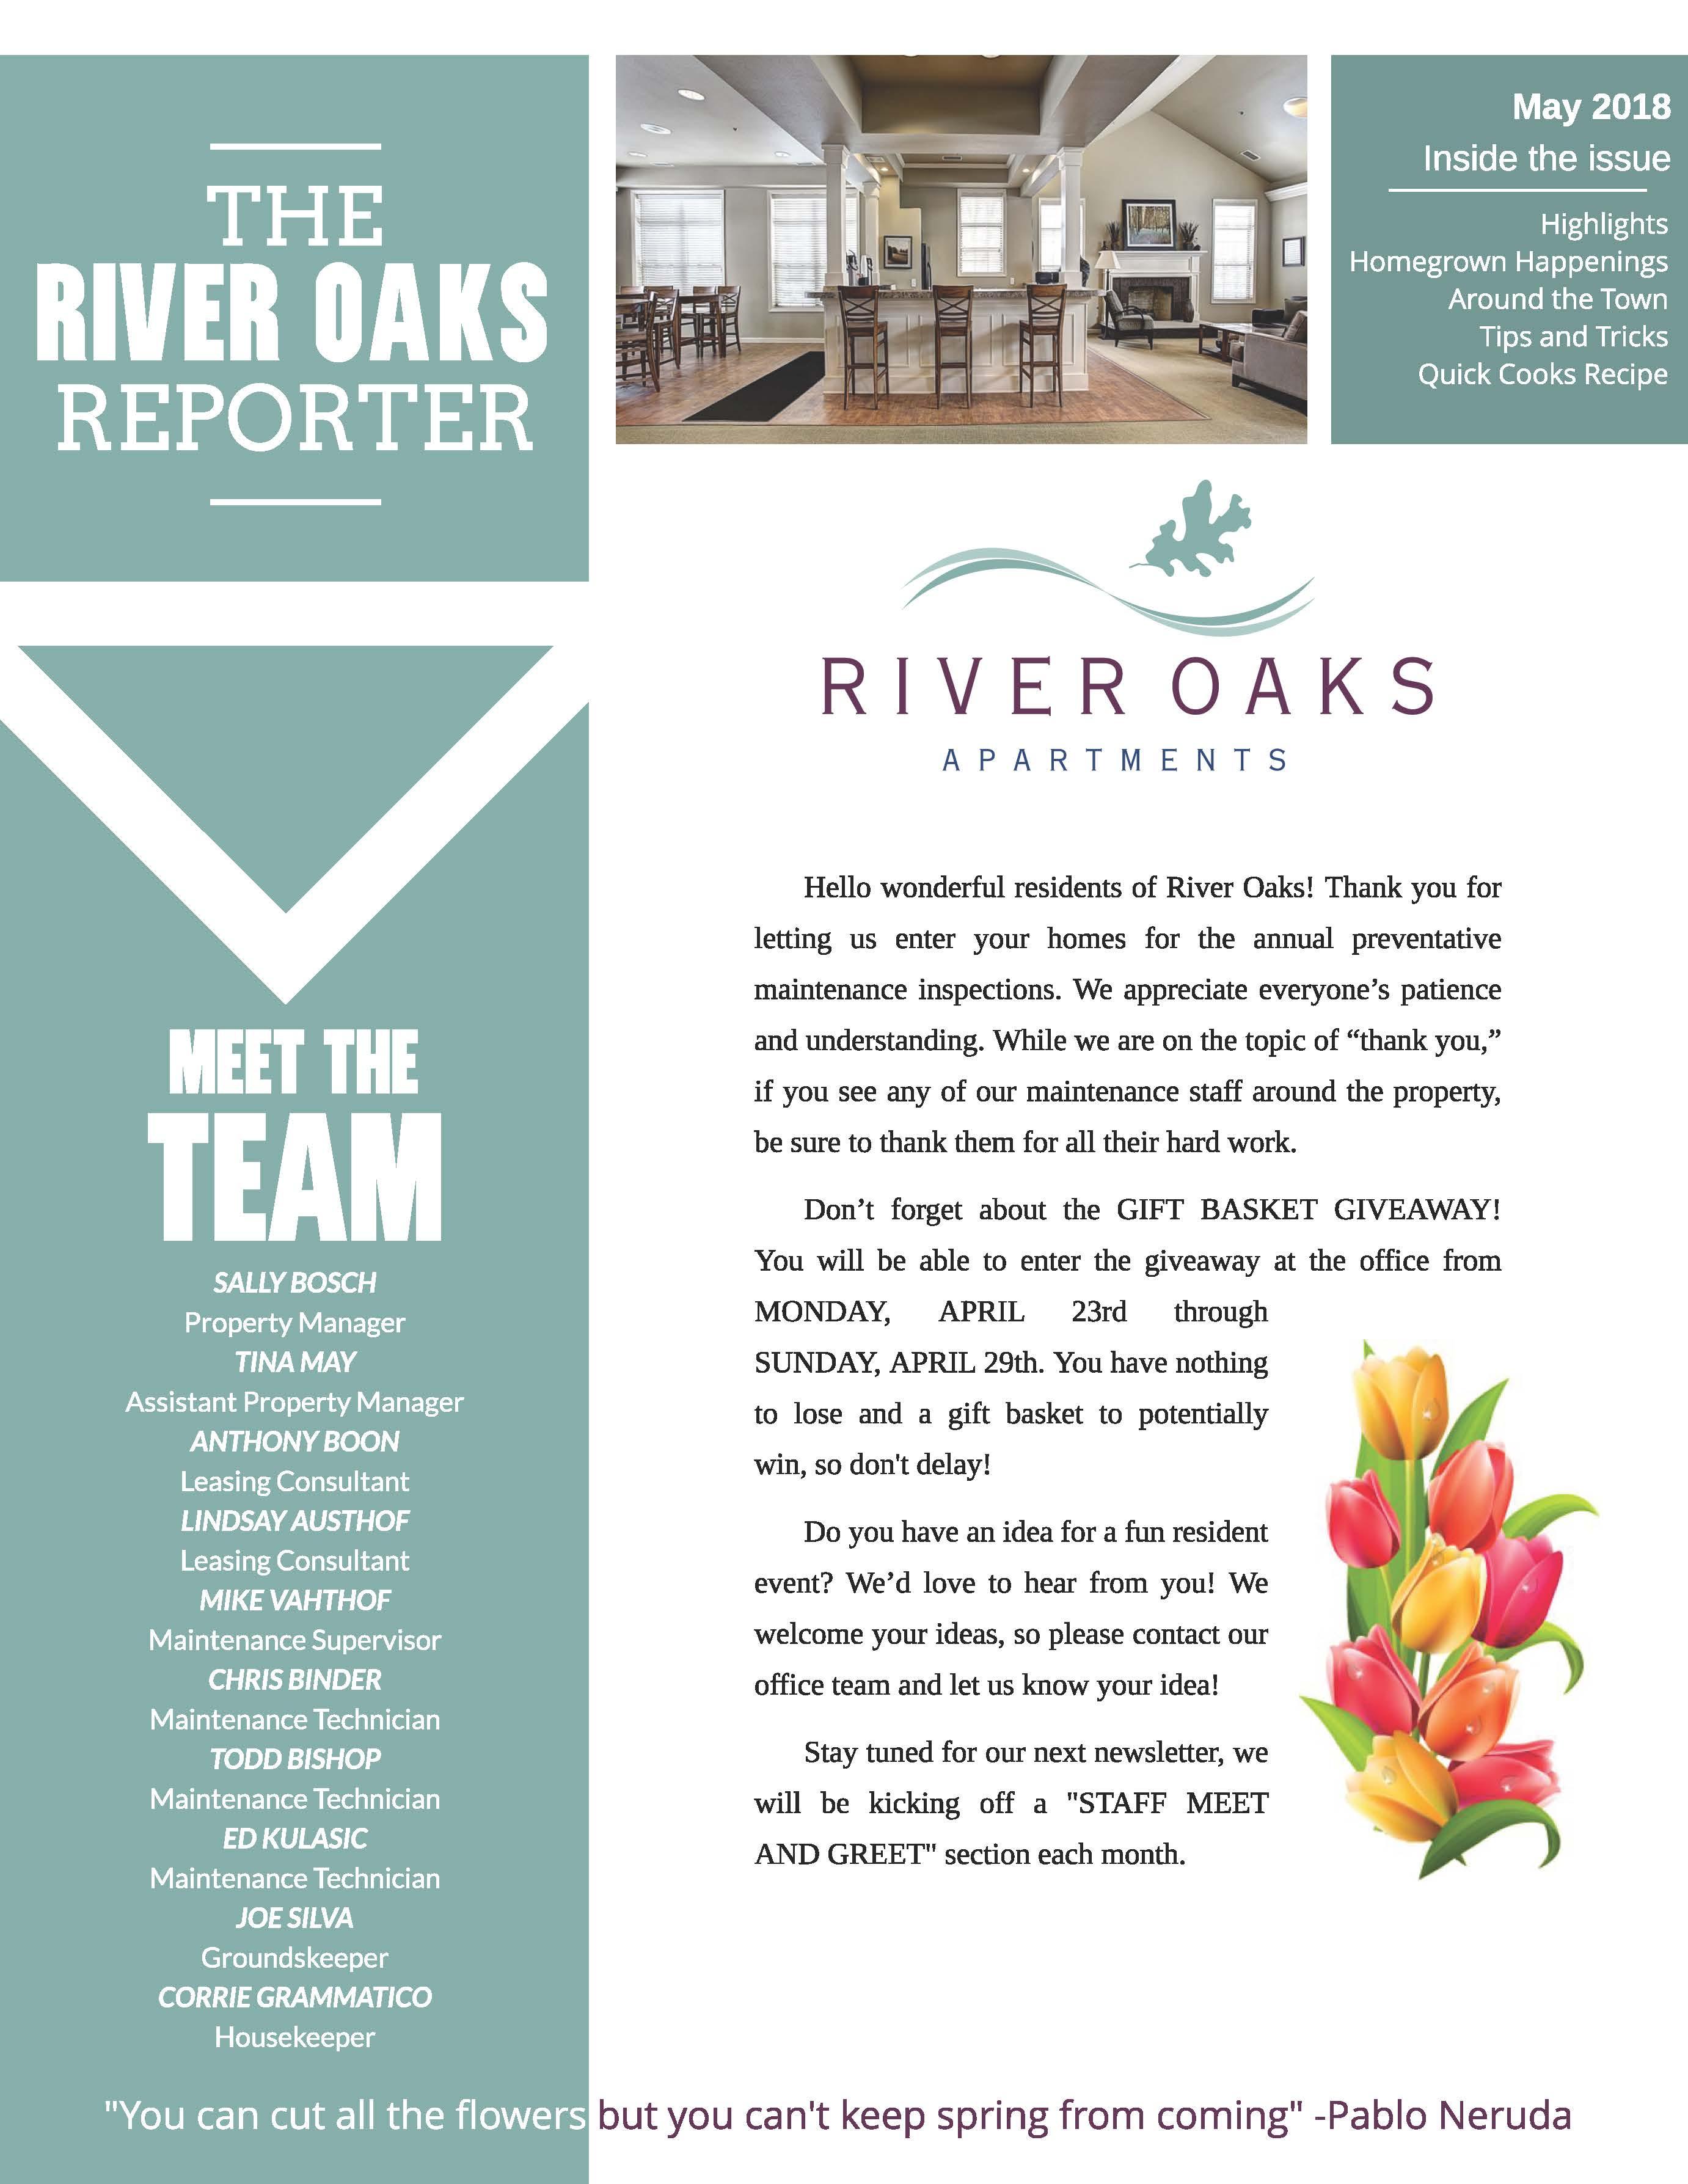 The River Oaks Community